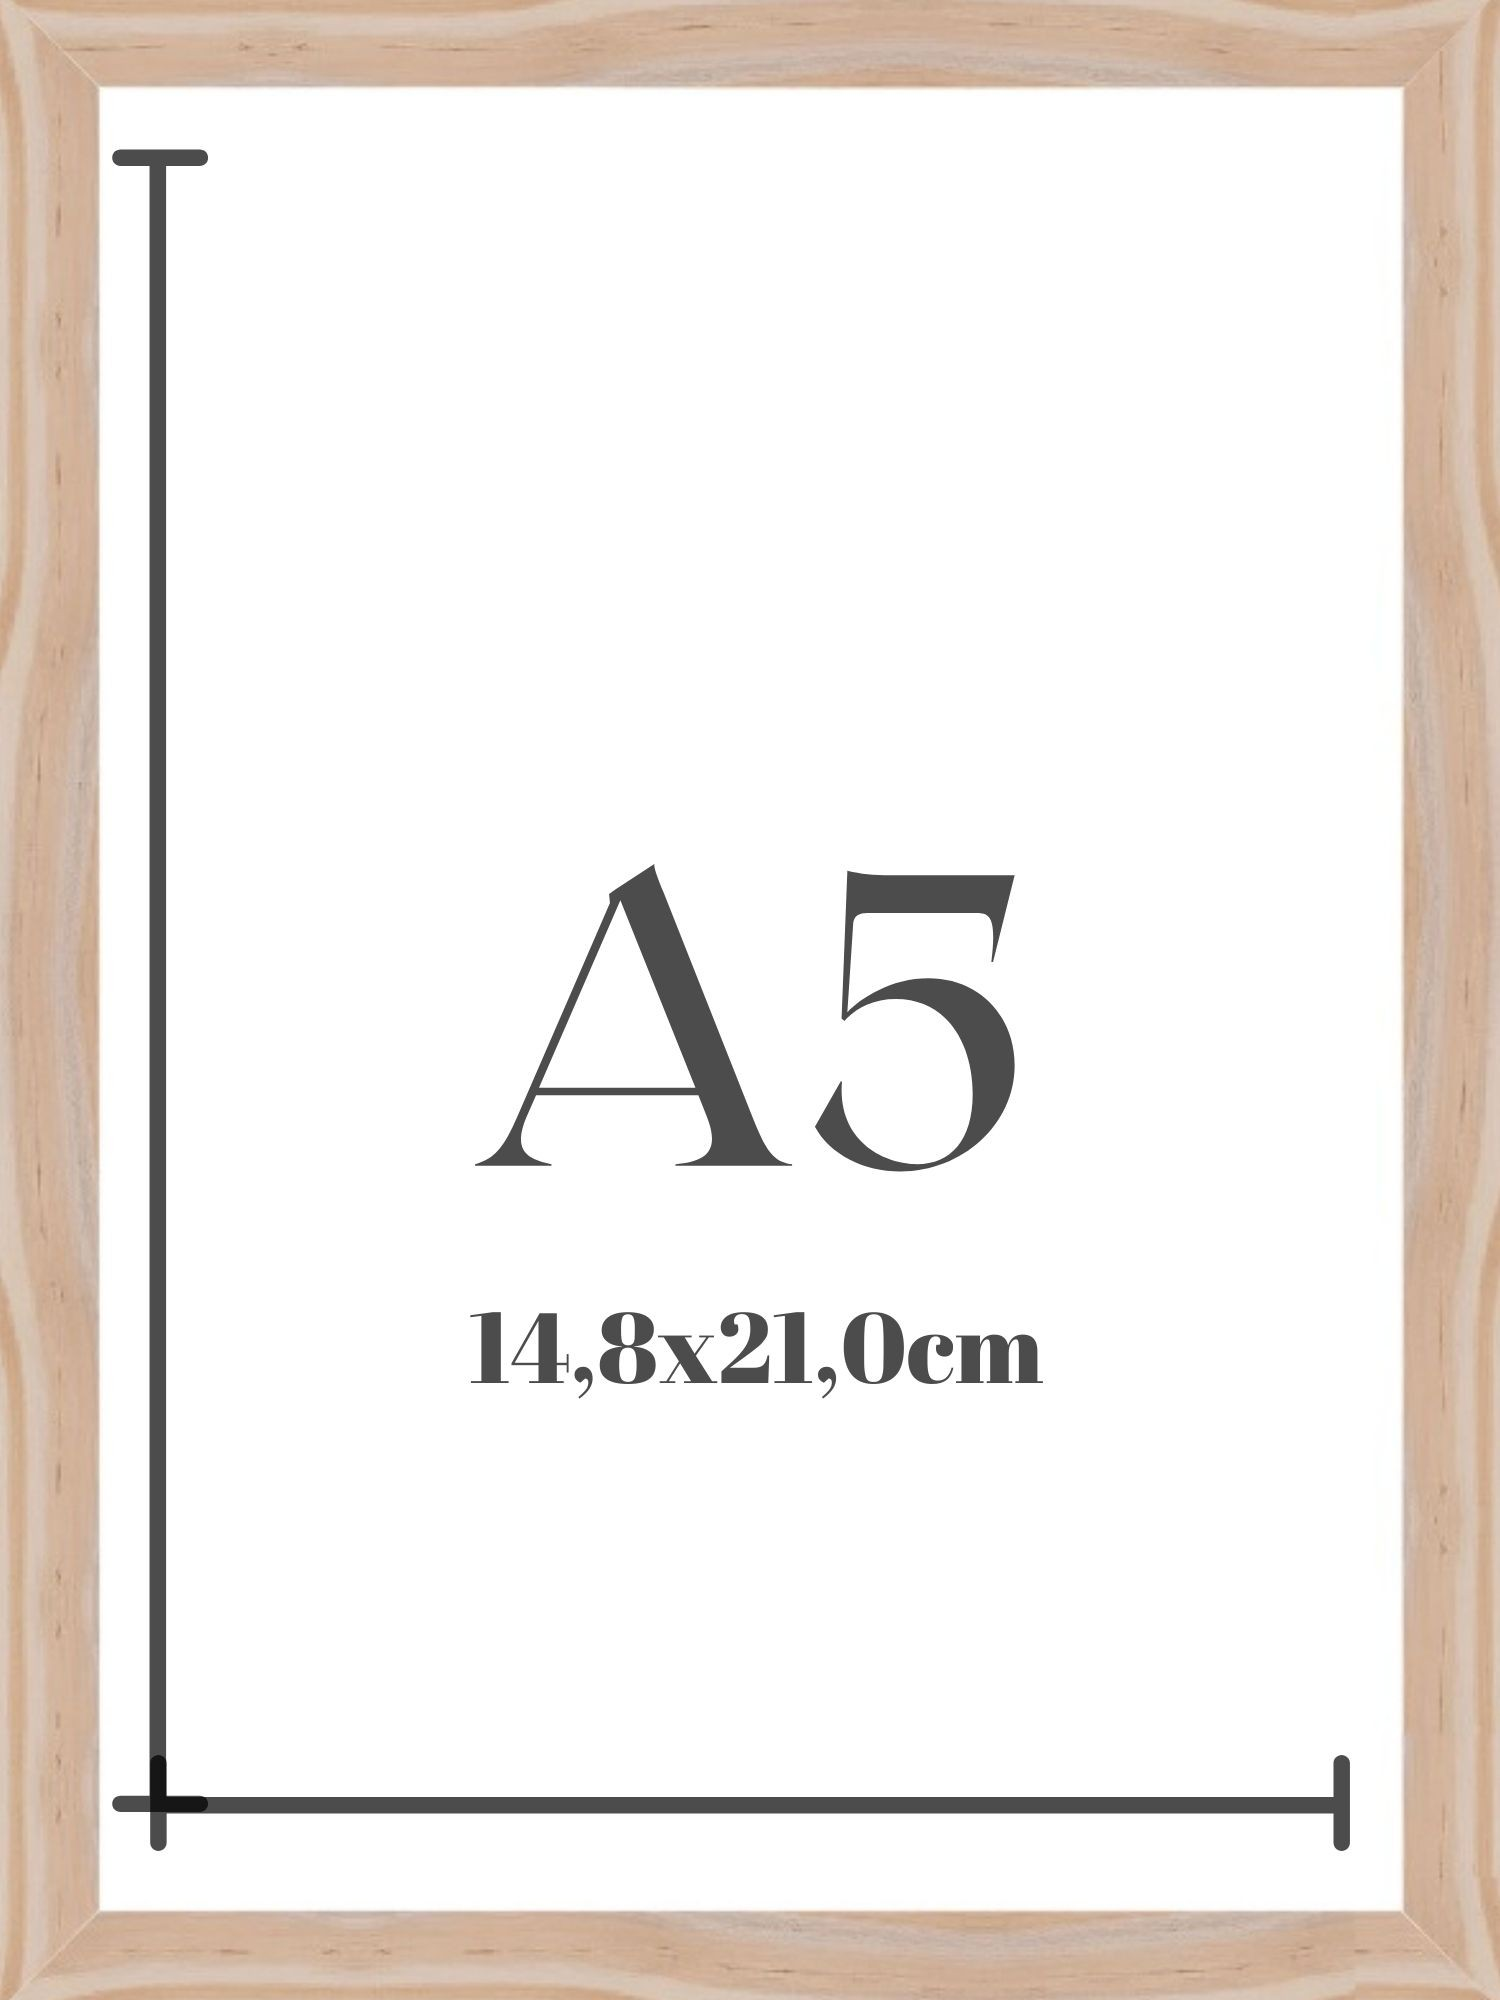 Moldura A5